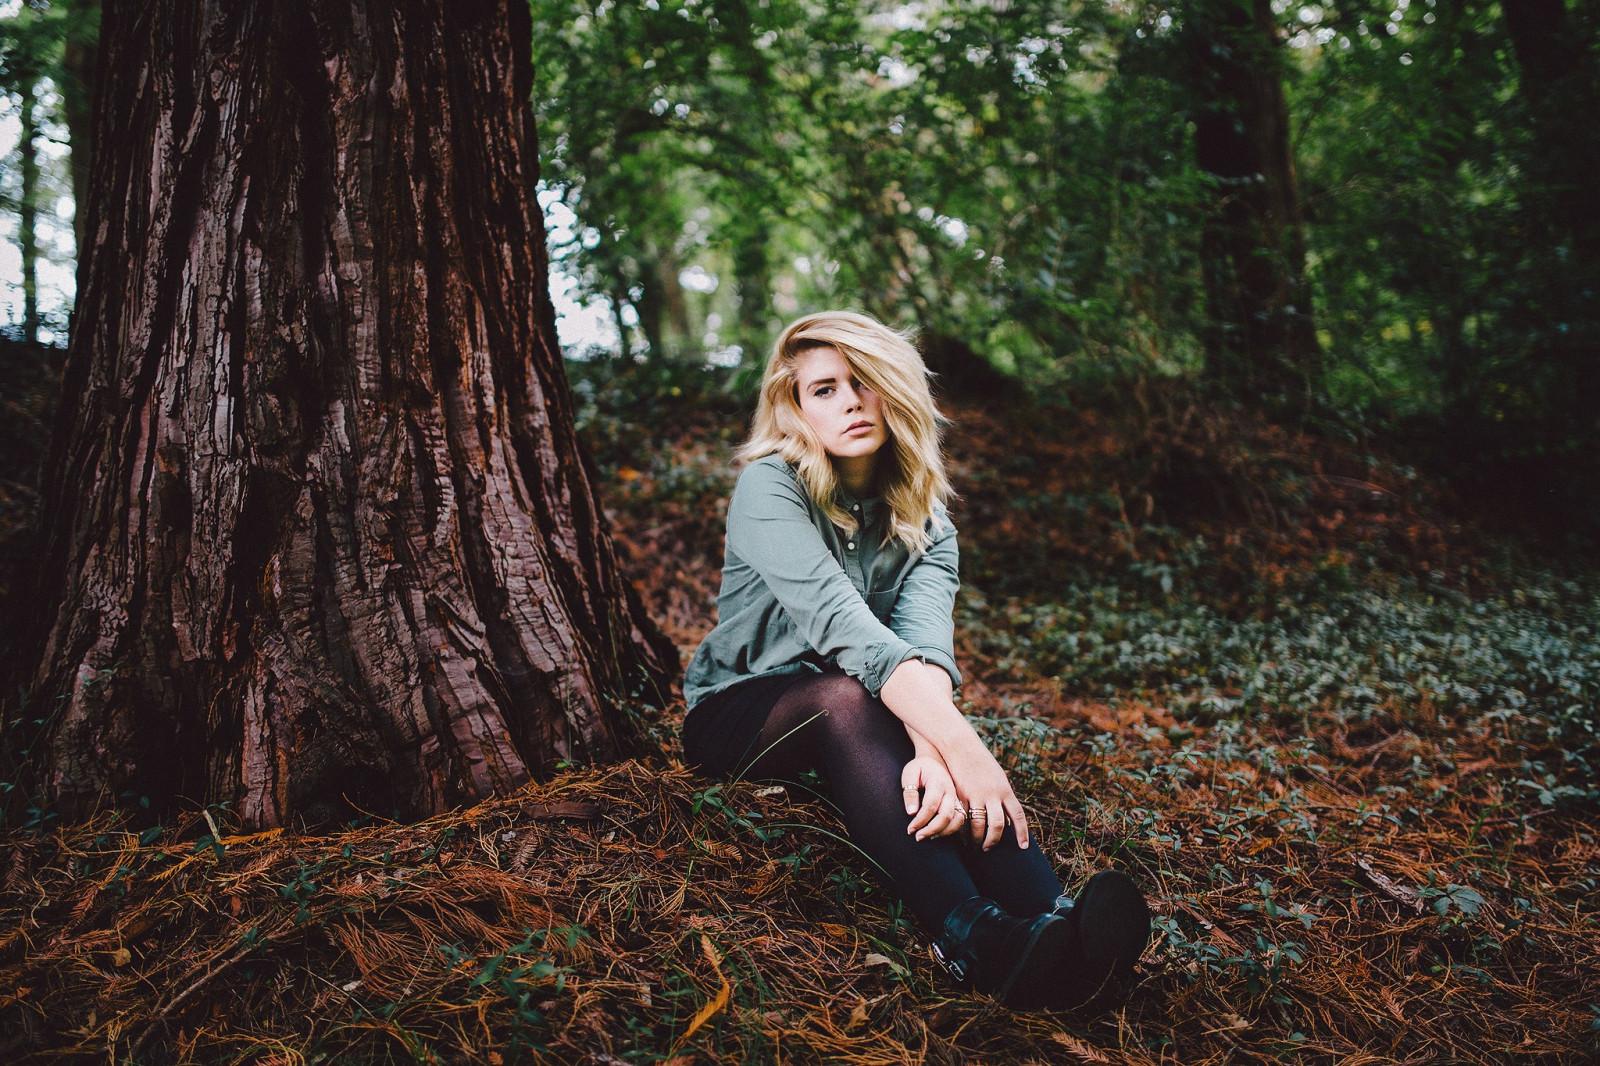 #1074078 sunlight, forest, women outdoors, model, portrait